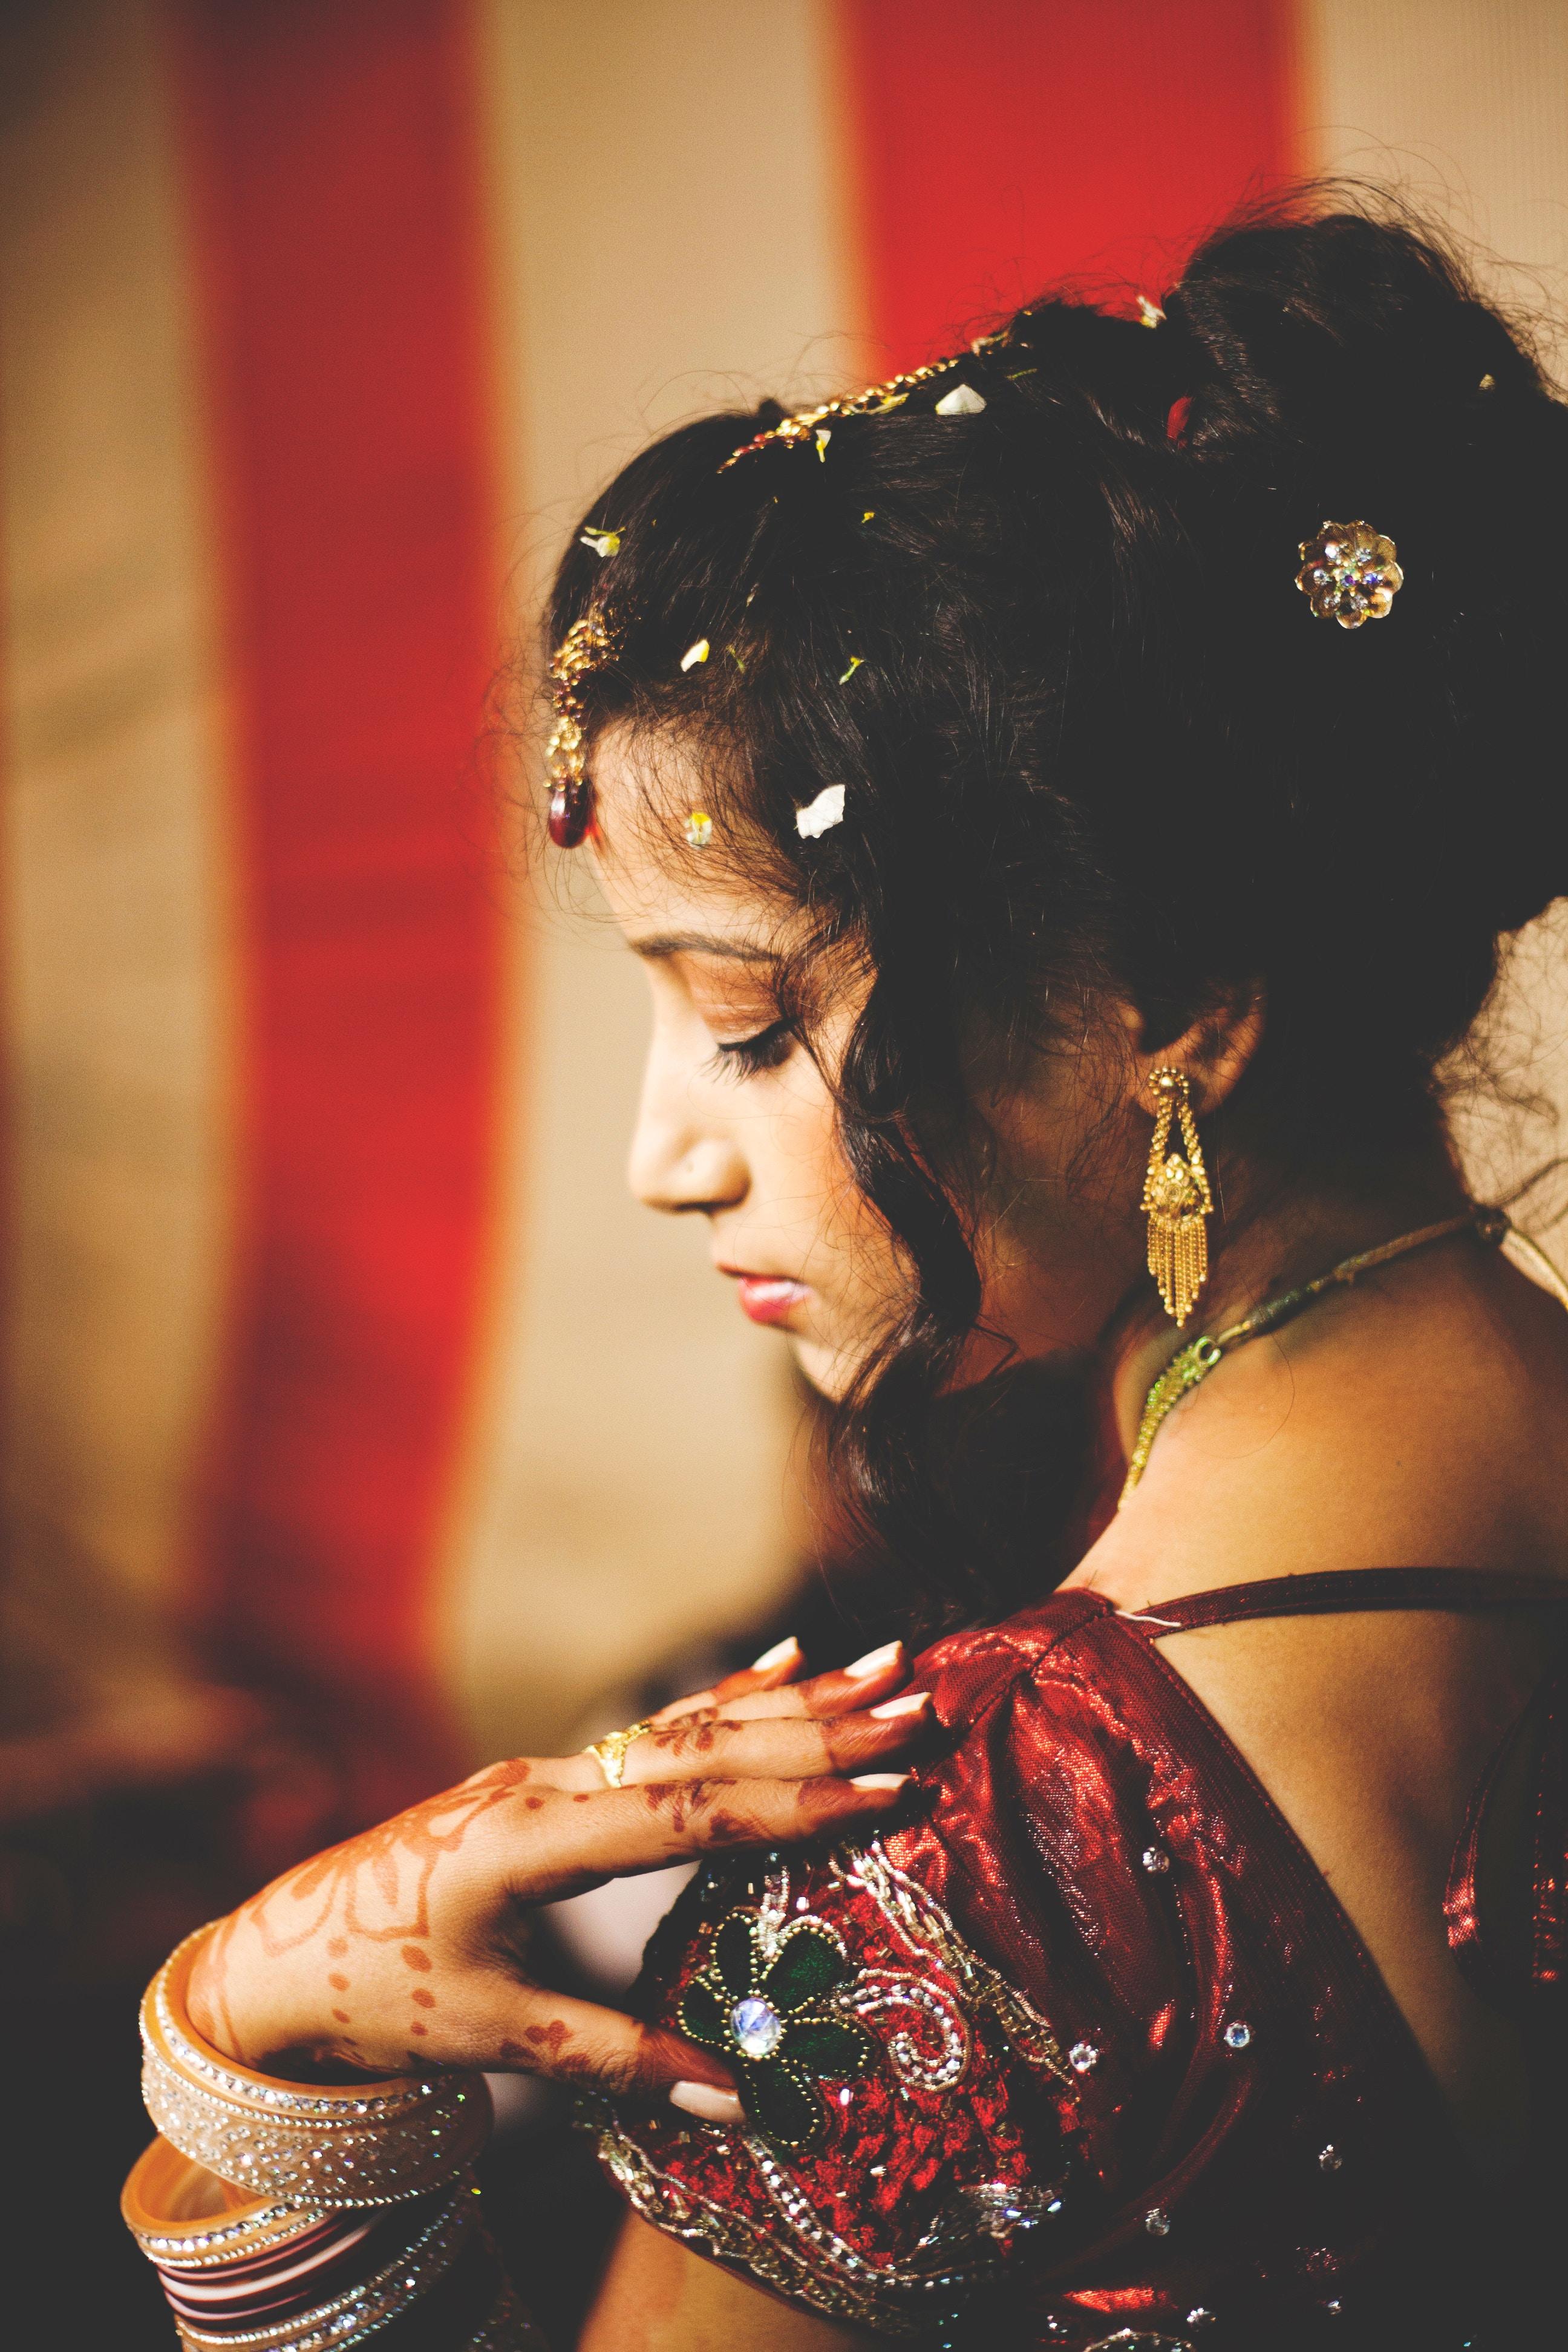 La beauté selon l'ayurvéda